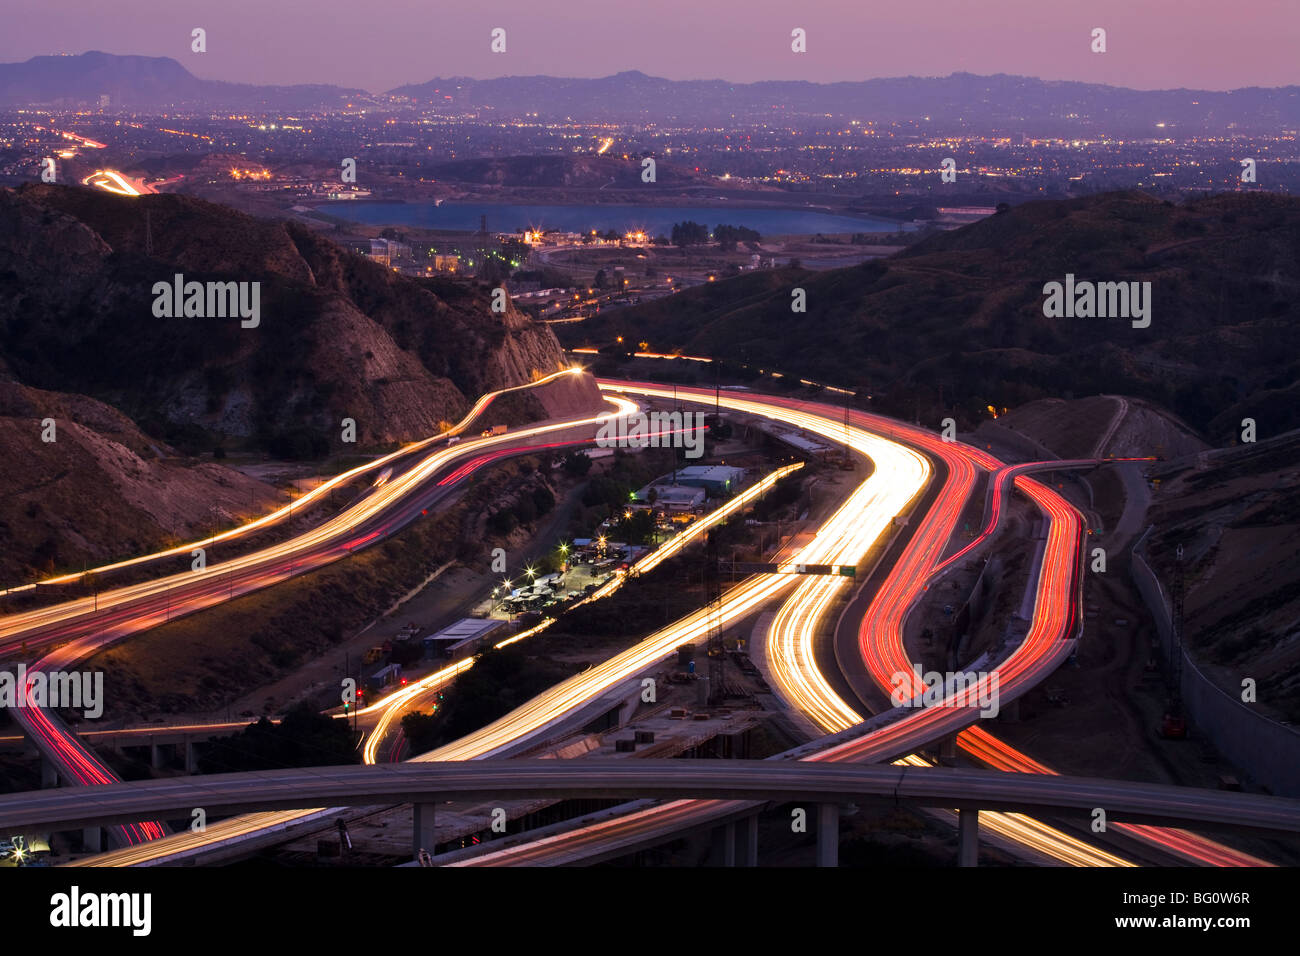 The Interchange Of The  Freeways Santa Clarita California United States Of America